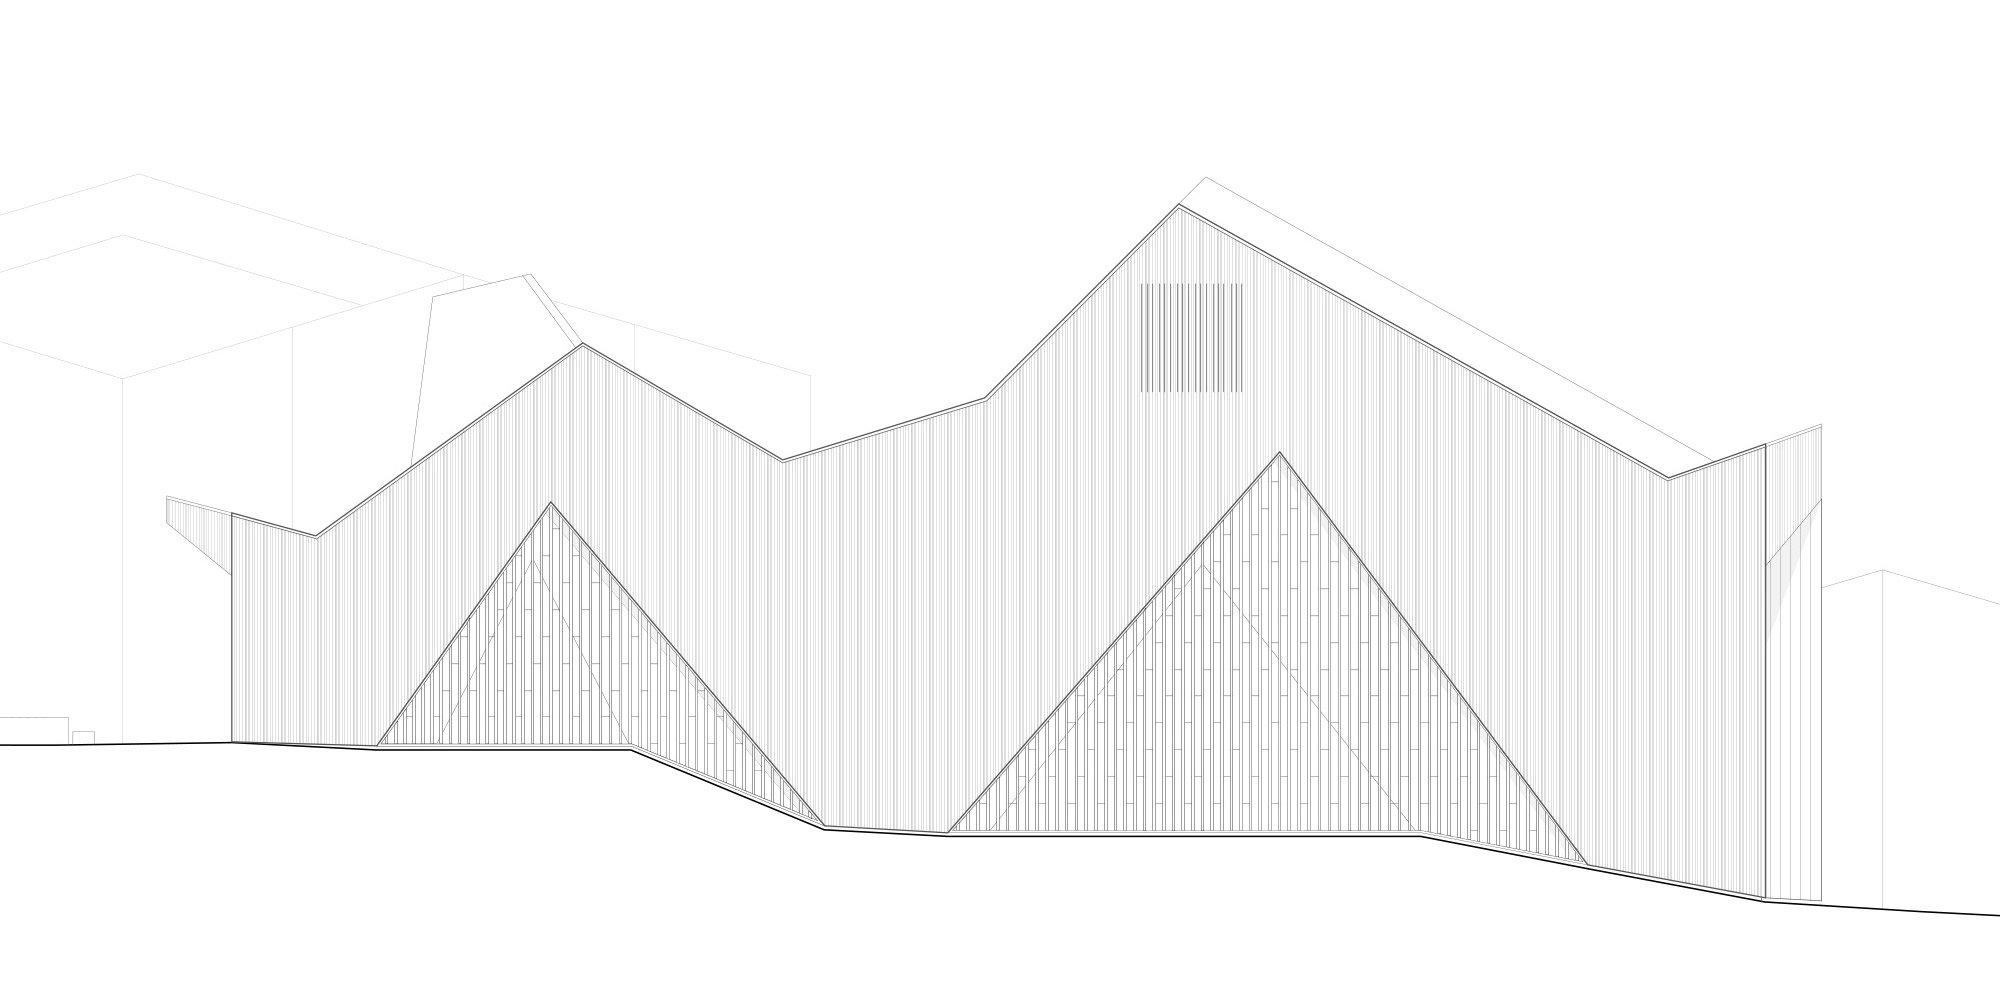 West Elevation © Localarchitecture